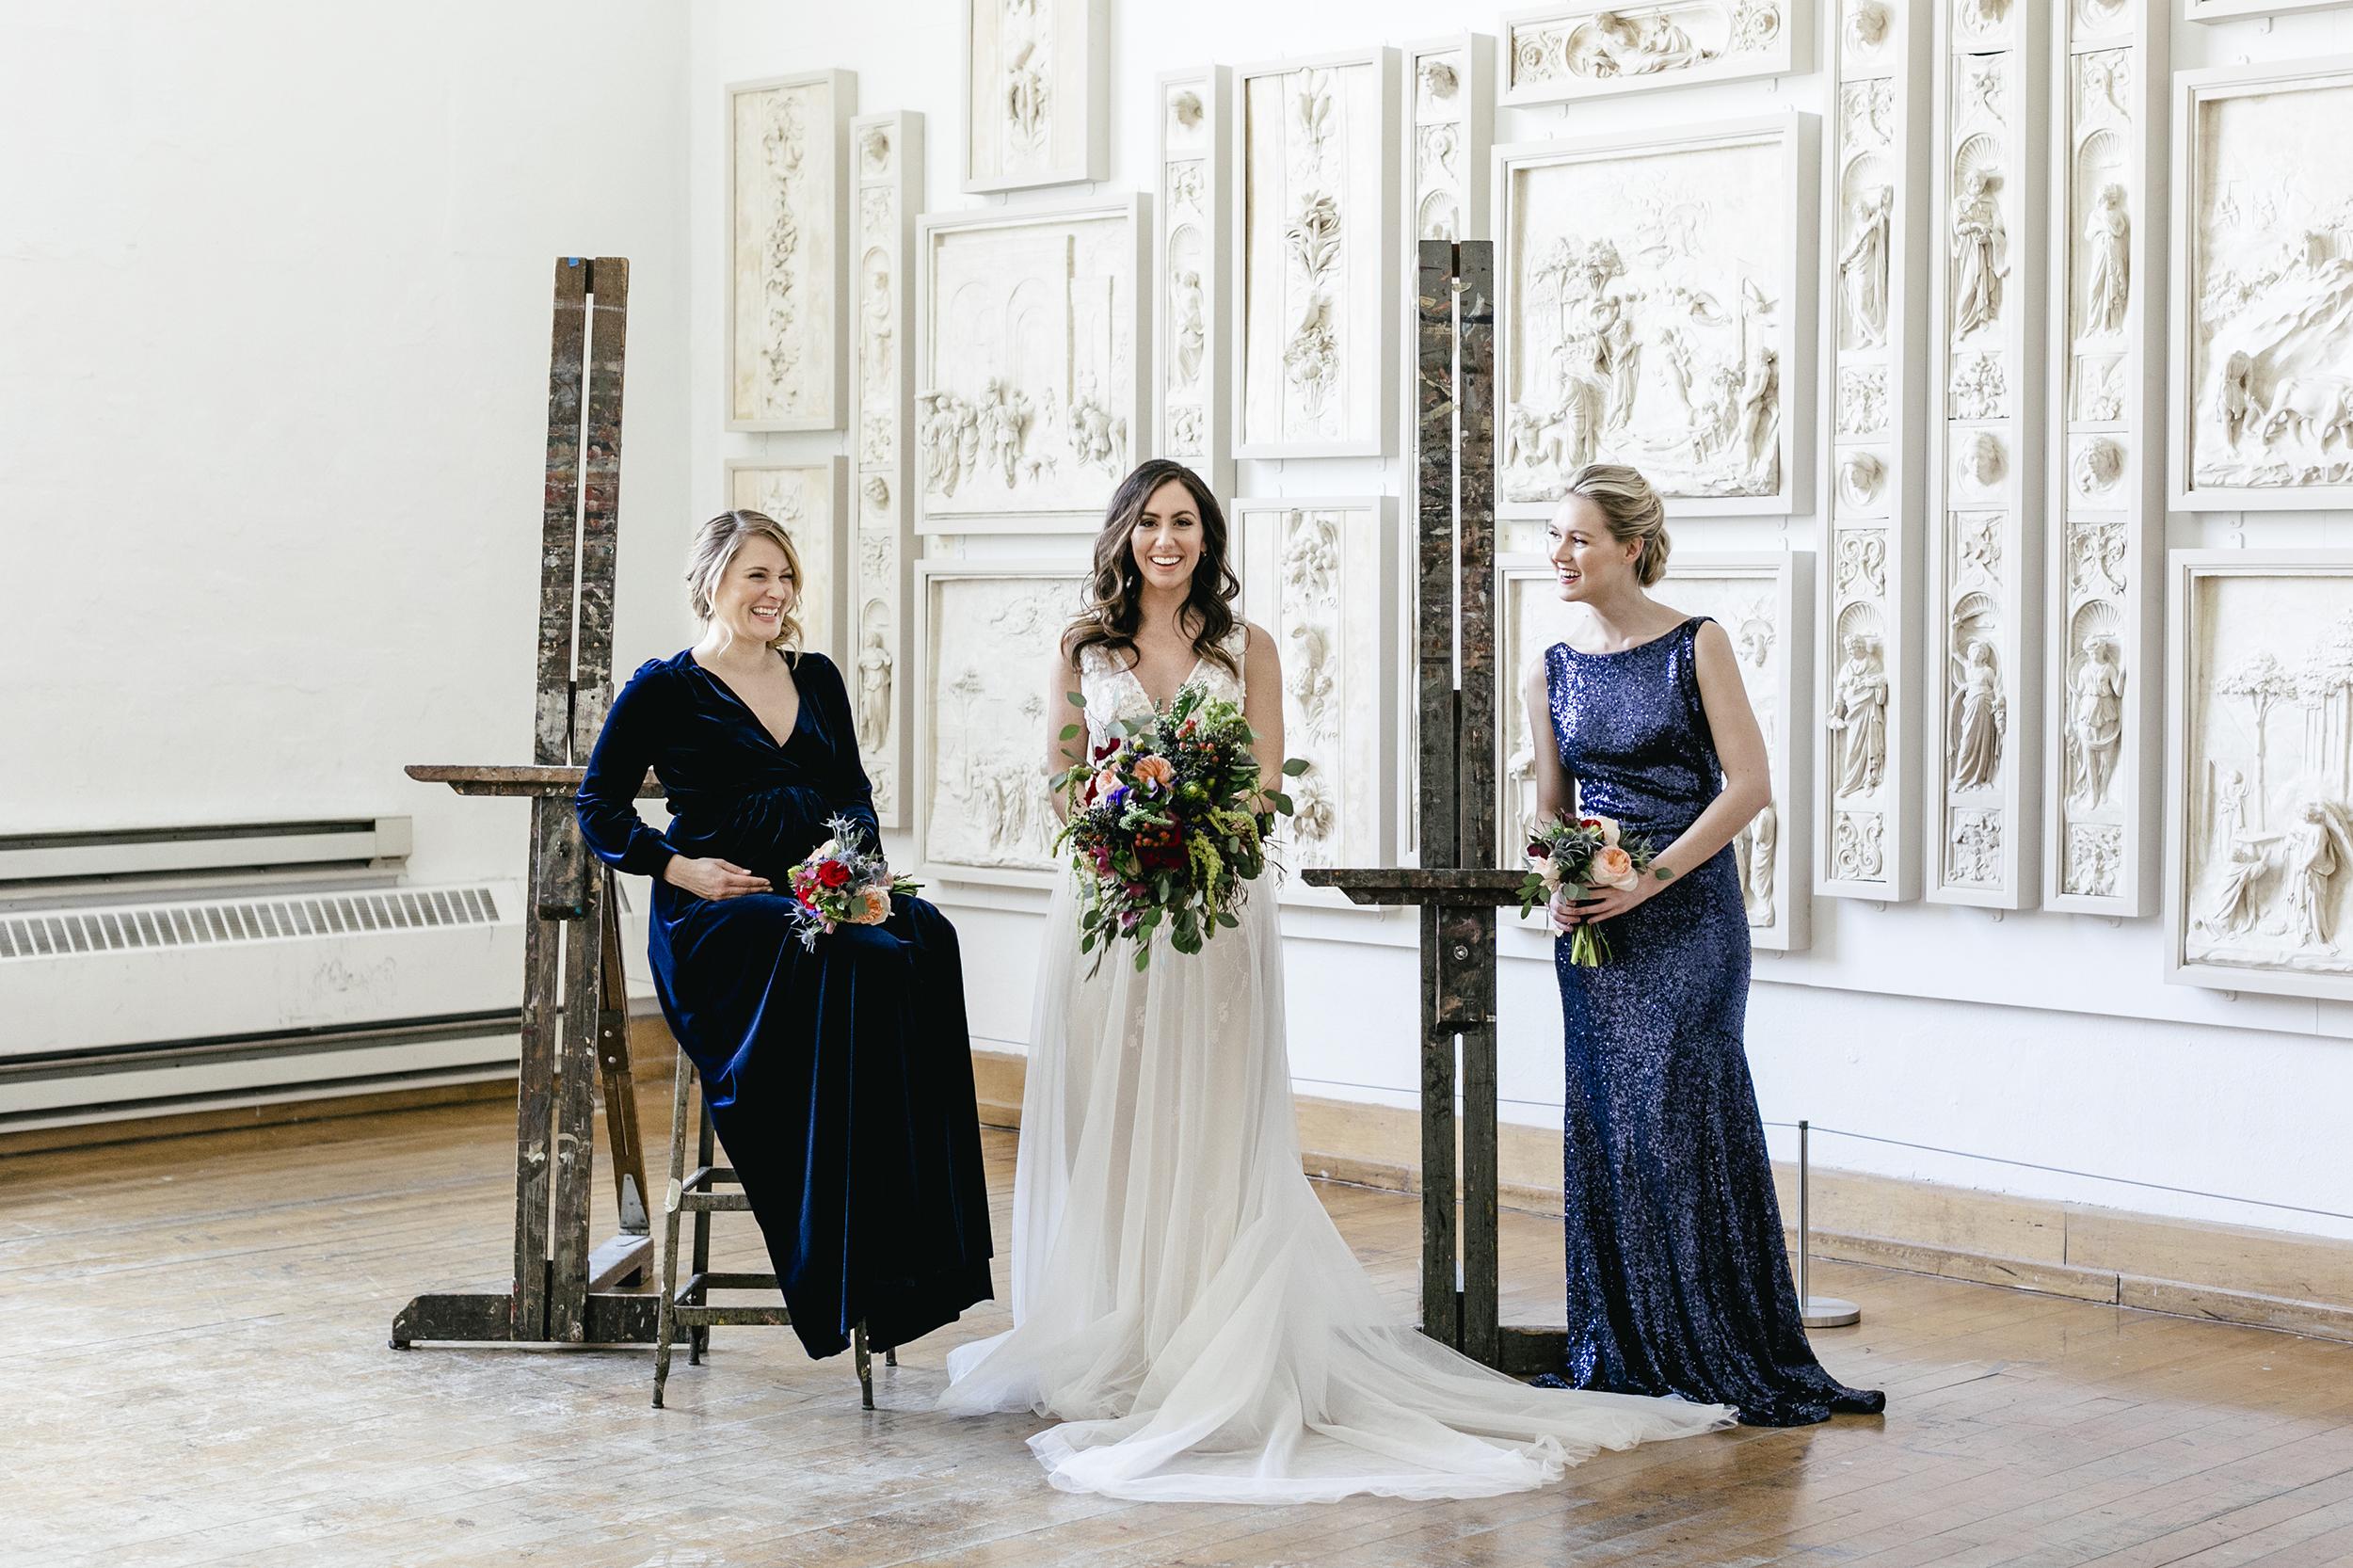 photography-wedding-weddings-natural-candid-pafa-pennsylvania academy-philadephia-philly-philadelphia wedding-mixed race-editorial-modern-fine-art-014.JPG